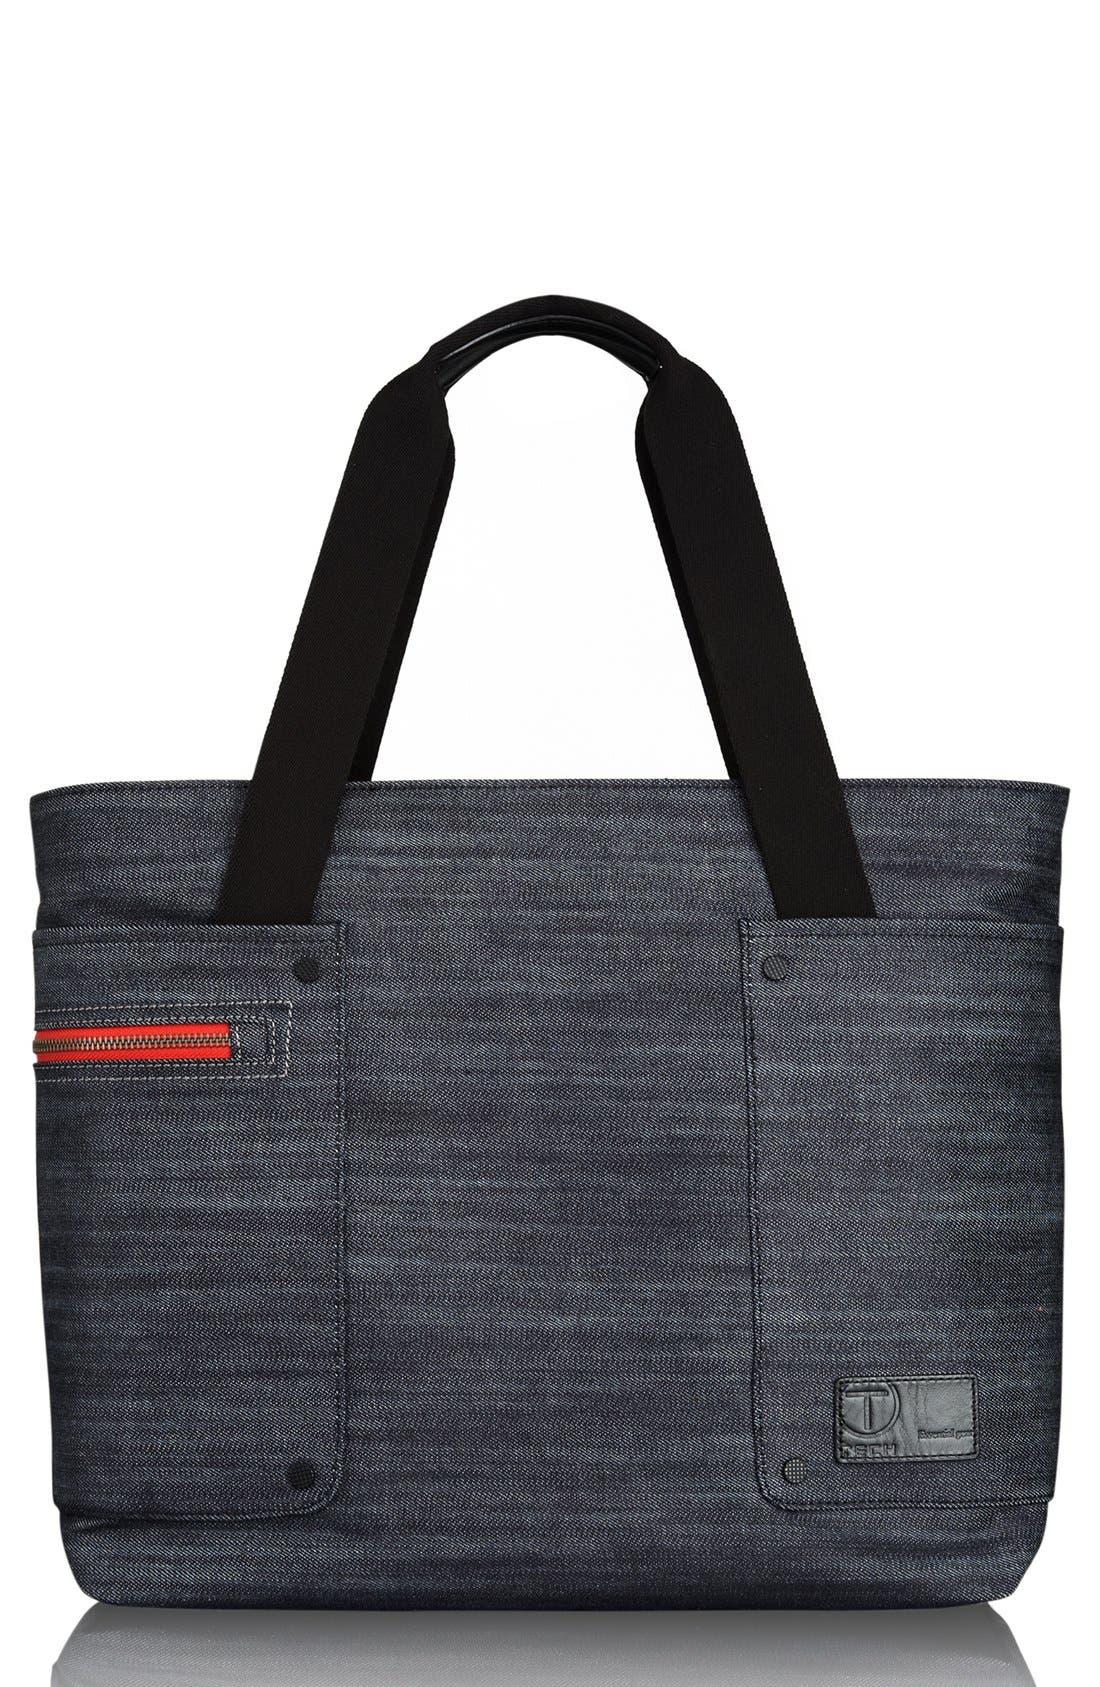 Main Image - T-Tech by Tumi 'Icon - Haley' Tote Bag